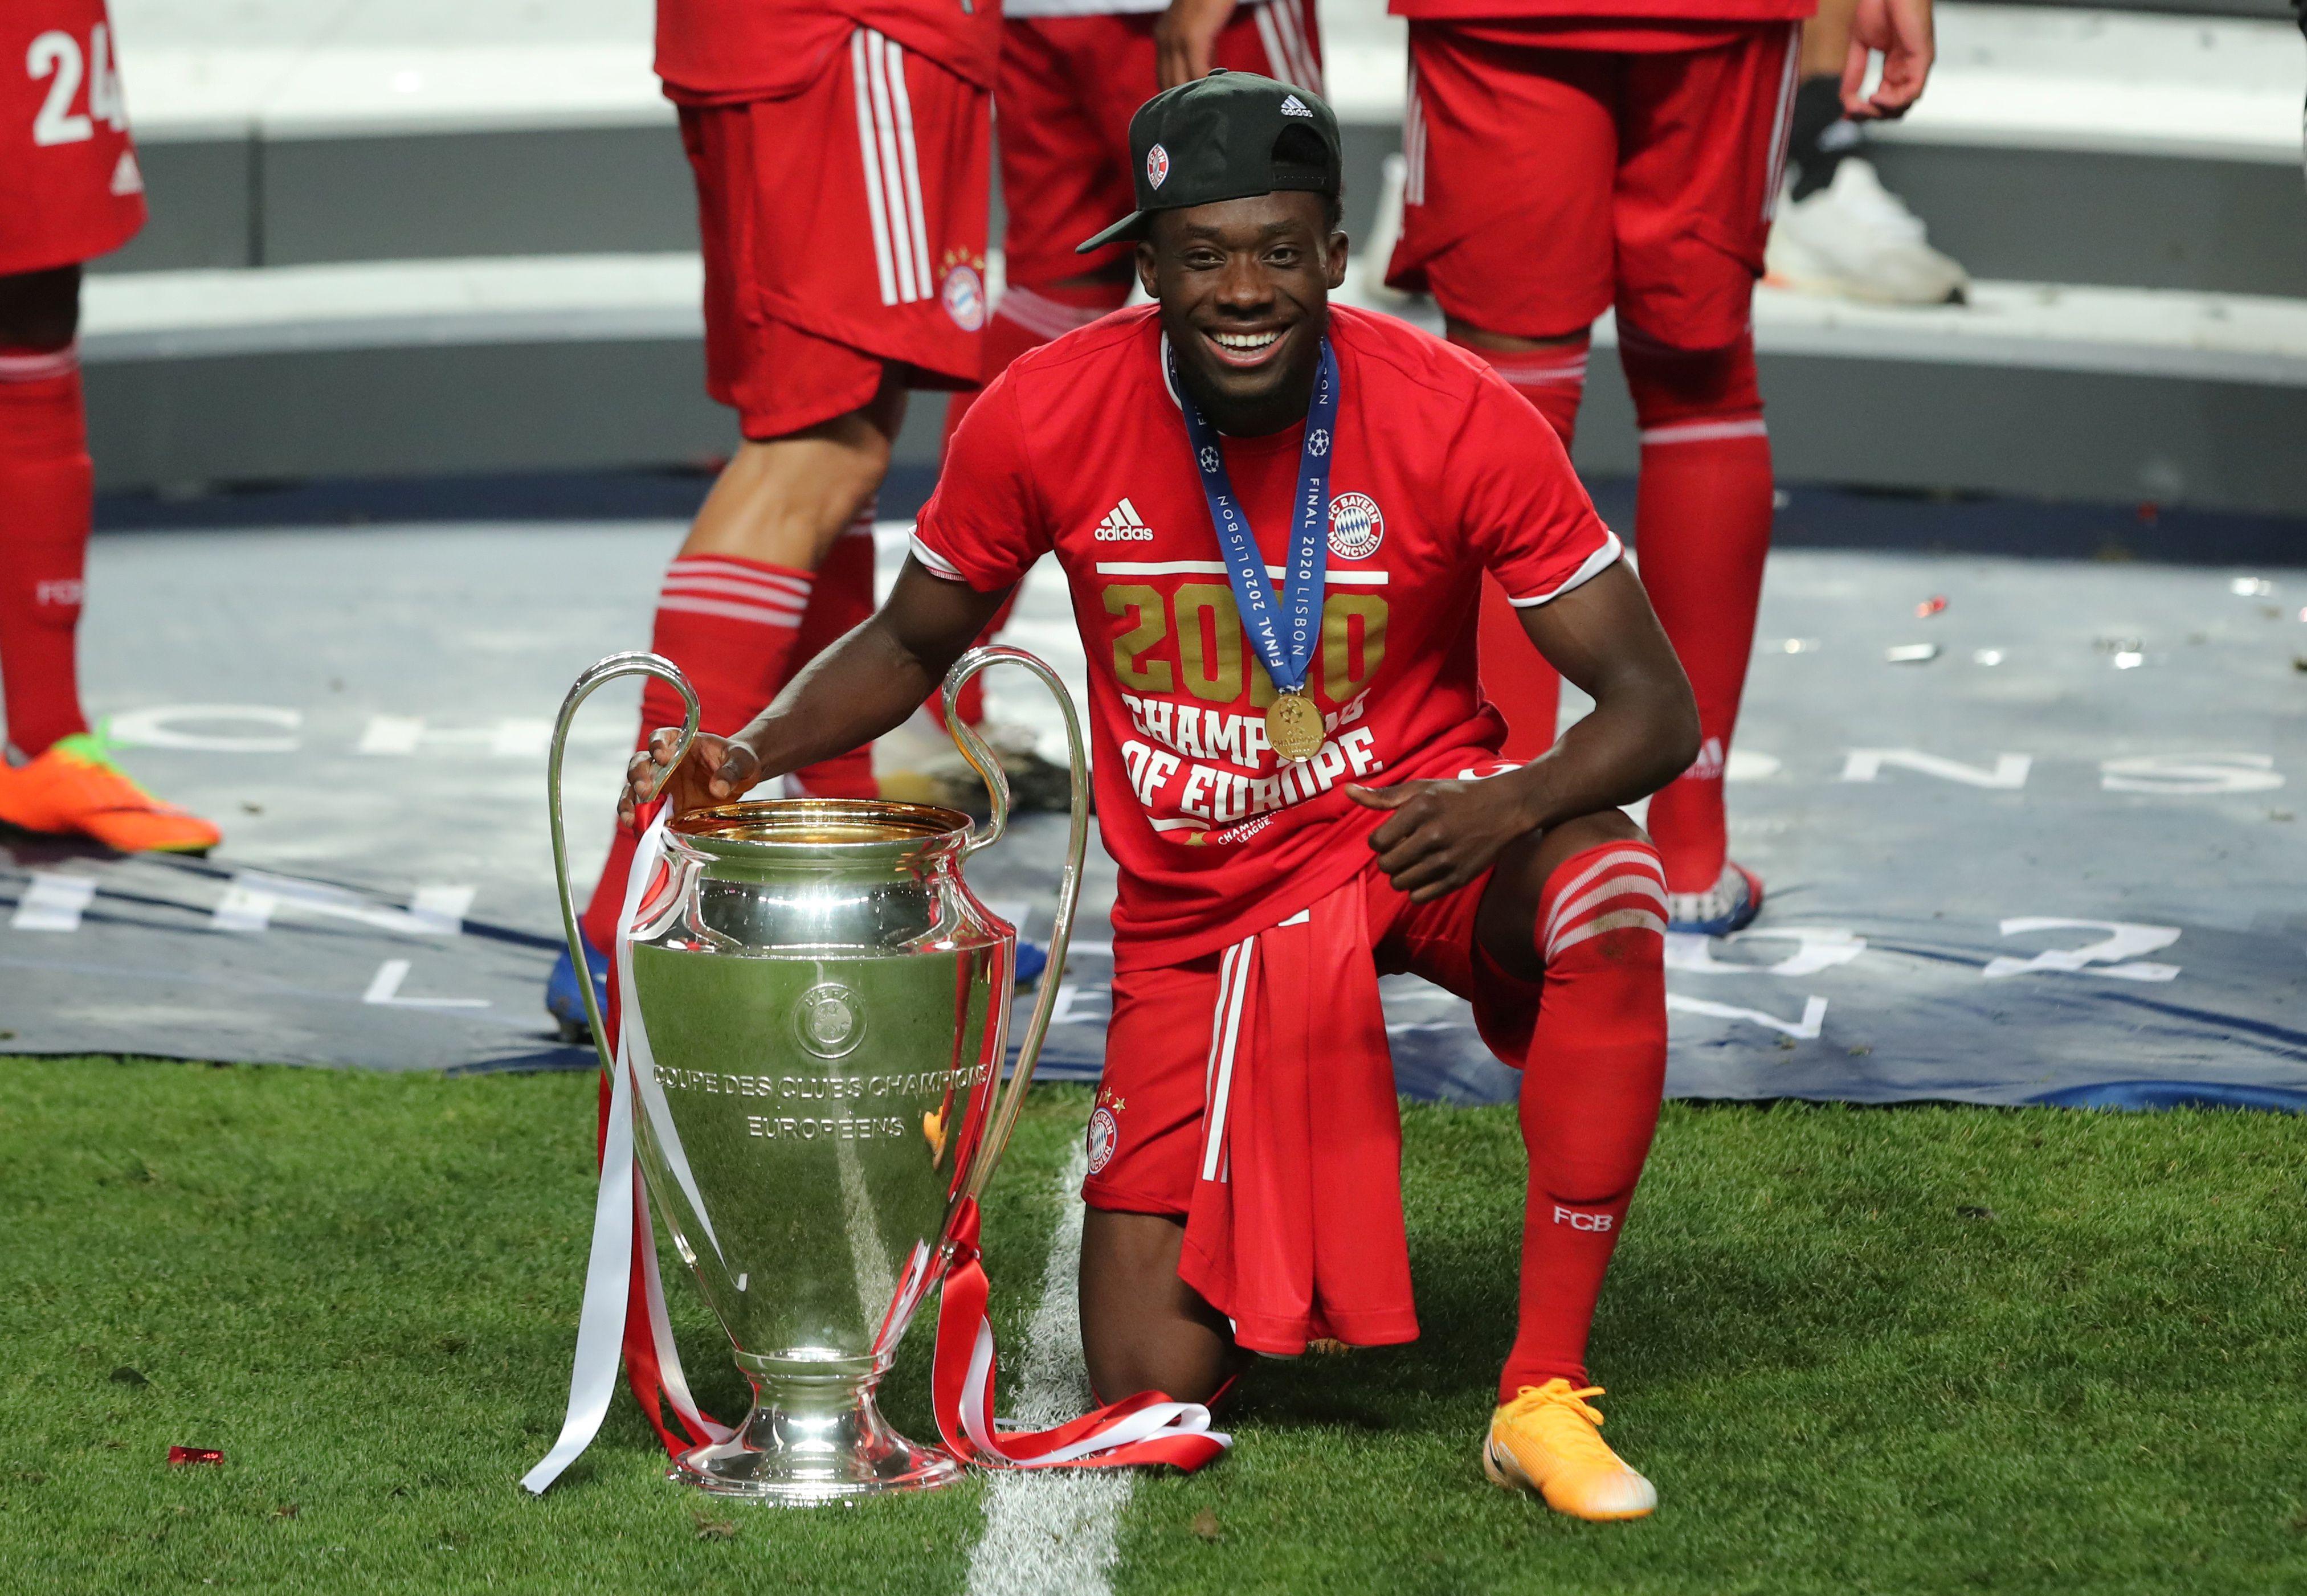 Alphonso Davies se consagró campeón de la Champions League este domingo con el Bayern Munich (Miguel A. Lopes/Pool via REUTERS)